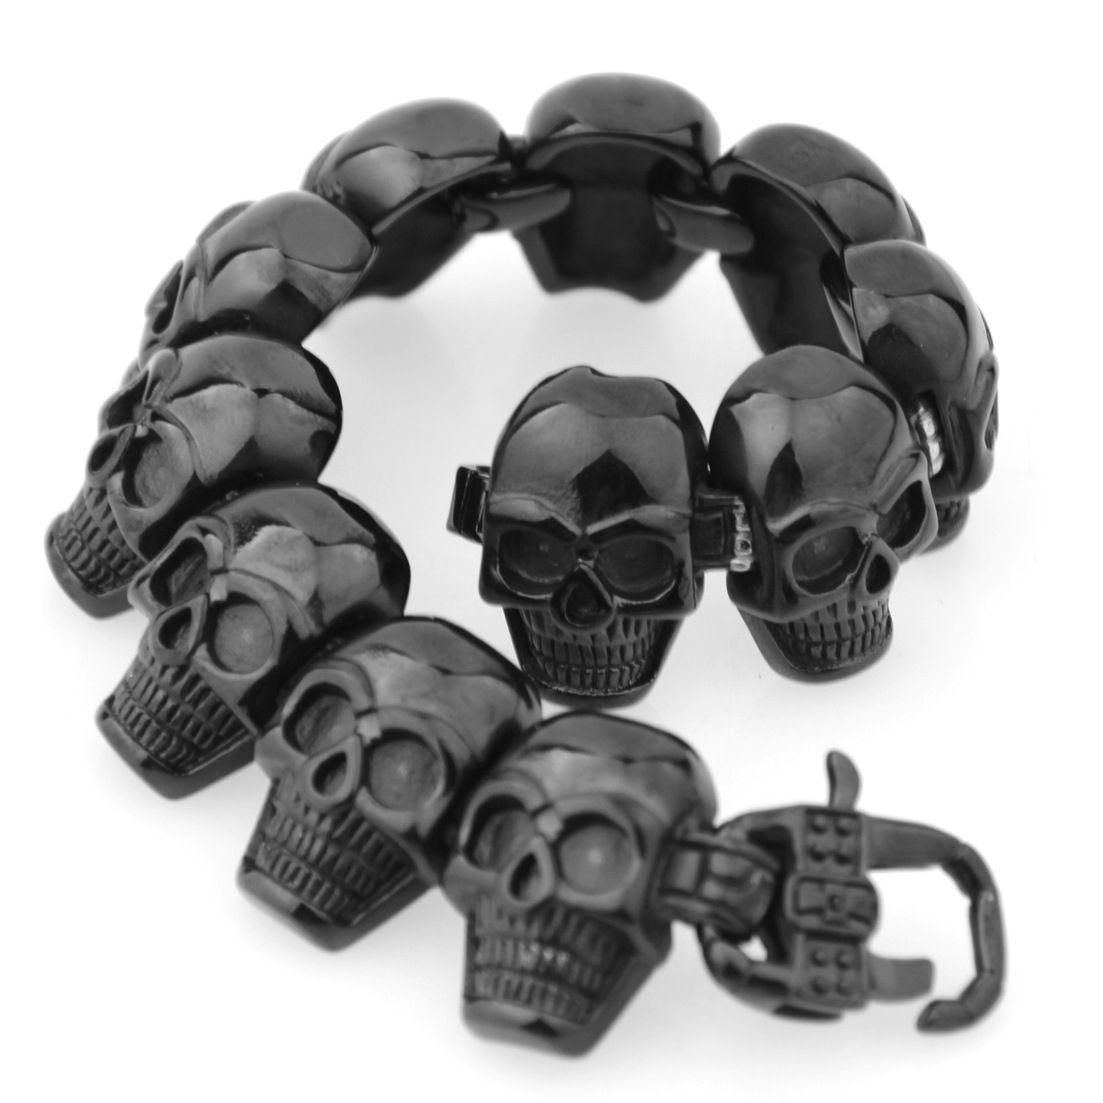 Hip hop Stainless Steel Men's Skeleton Skull Head bracelets Big Huge Heavy Solid Ghost bangle motorcycle Biker Punk Jewerly